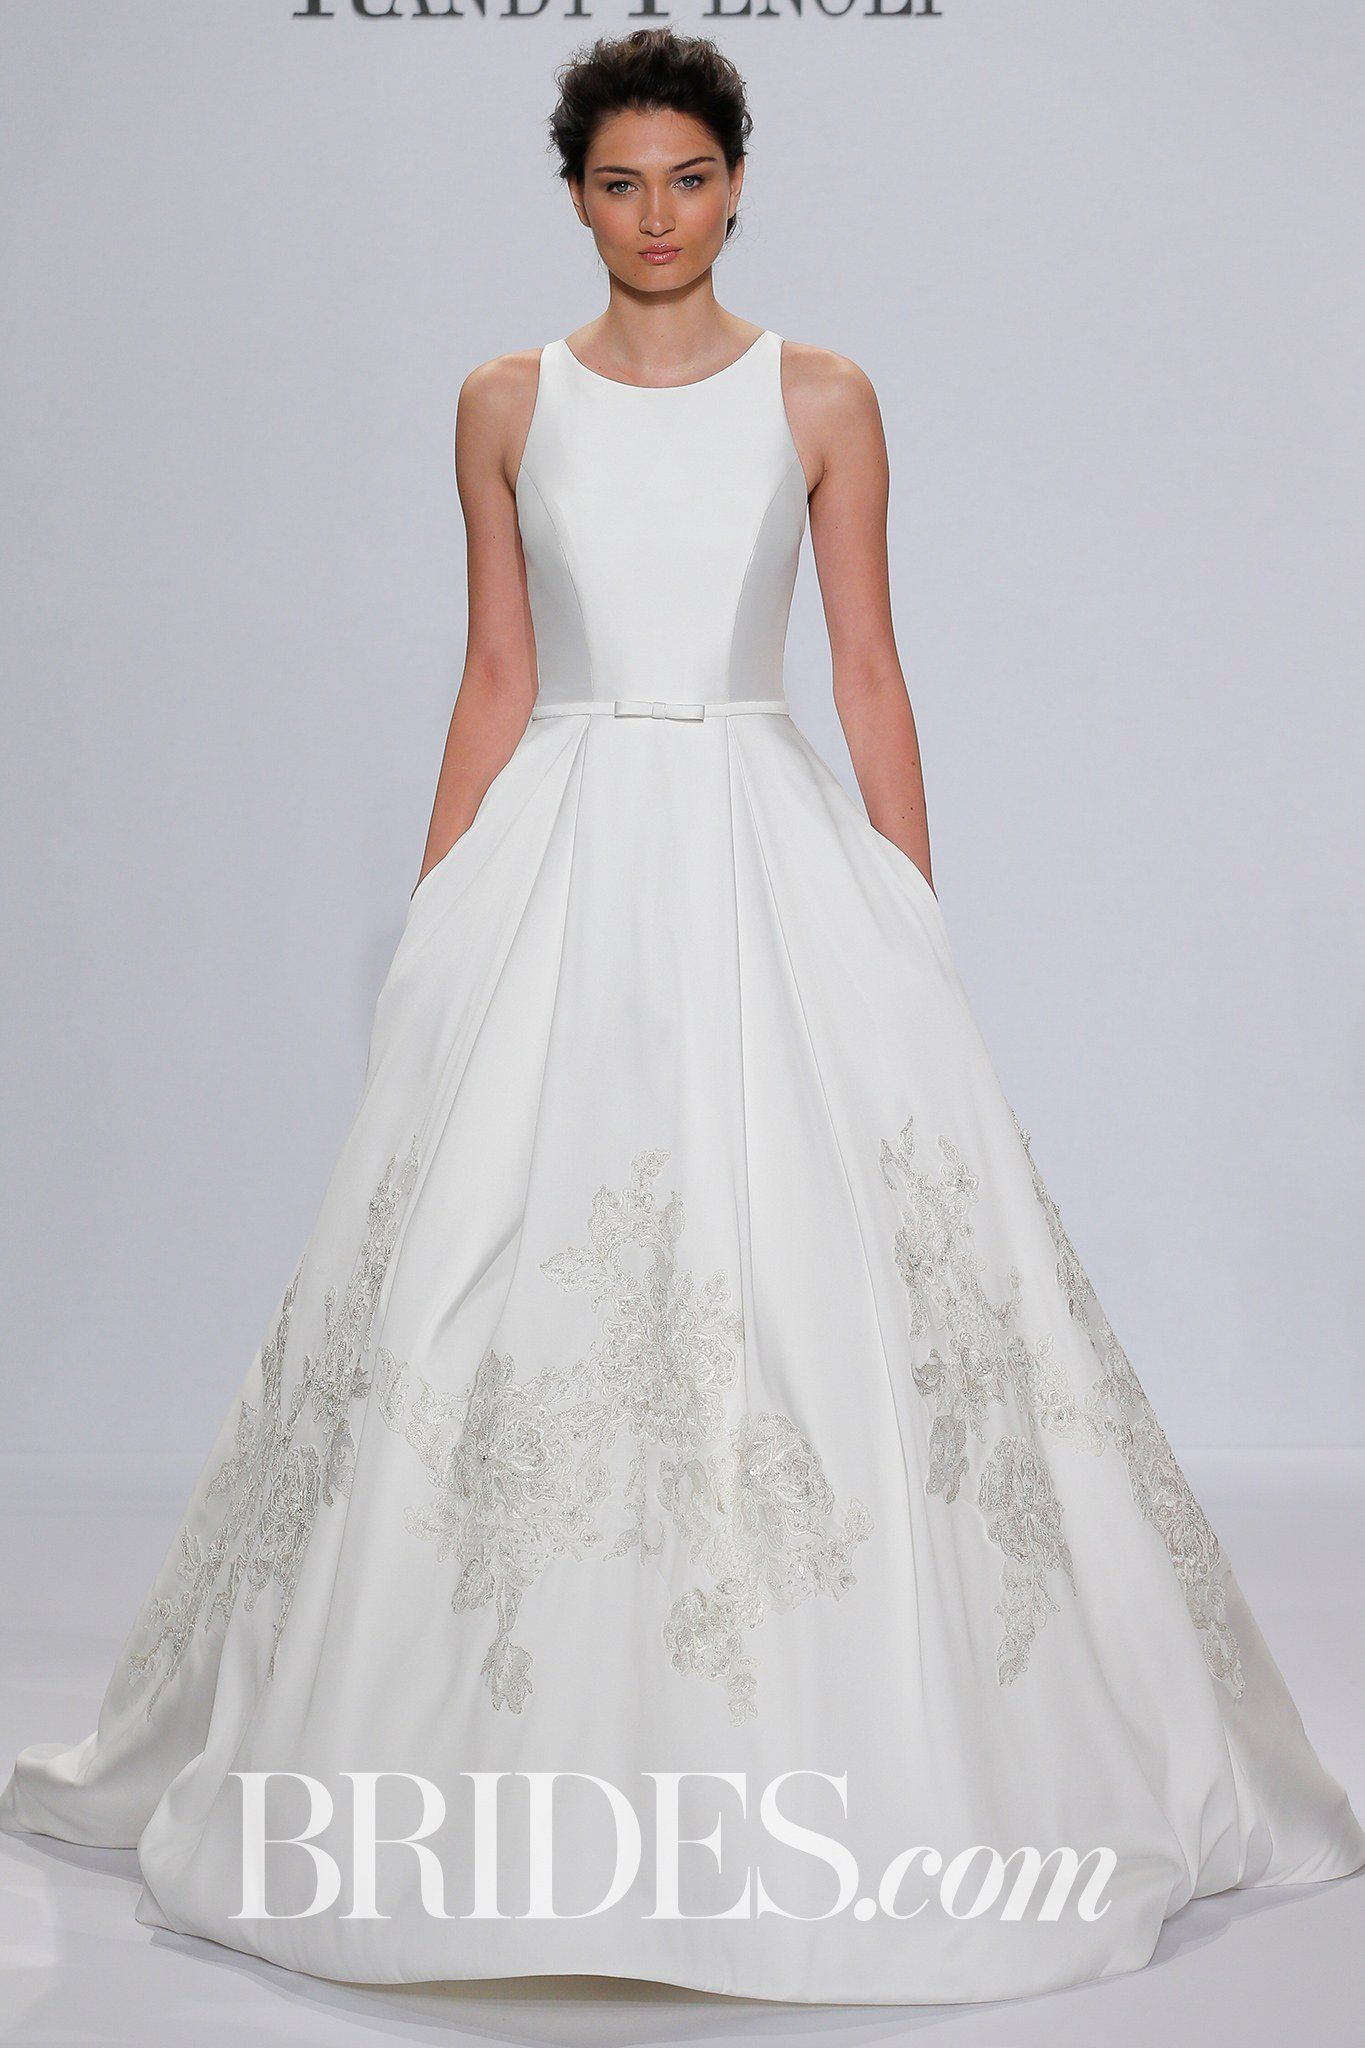 New Zealand Wedding Dress Designers New Couture Wedding Gown Designers Inspirational Blu Col In 2020 Wedding Dress Long Sleeve Wedding Dresses Kleinfeld Bridal Dresses